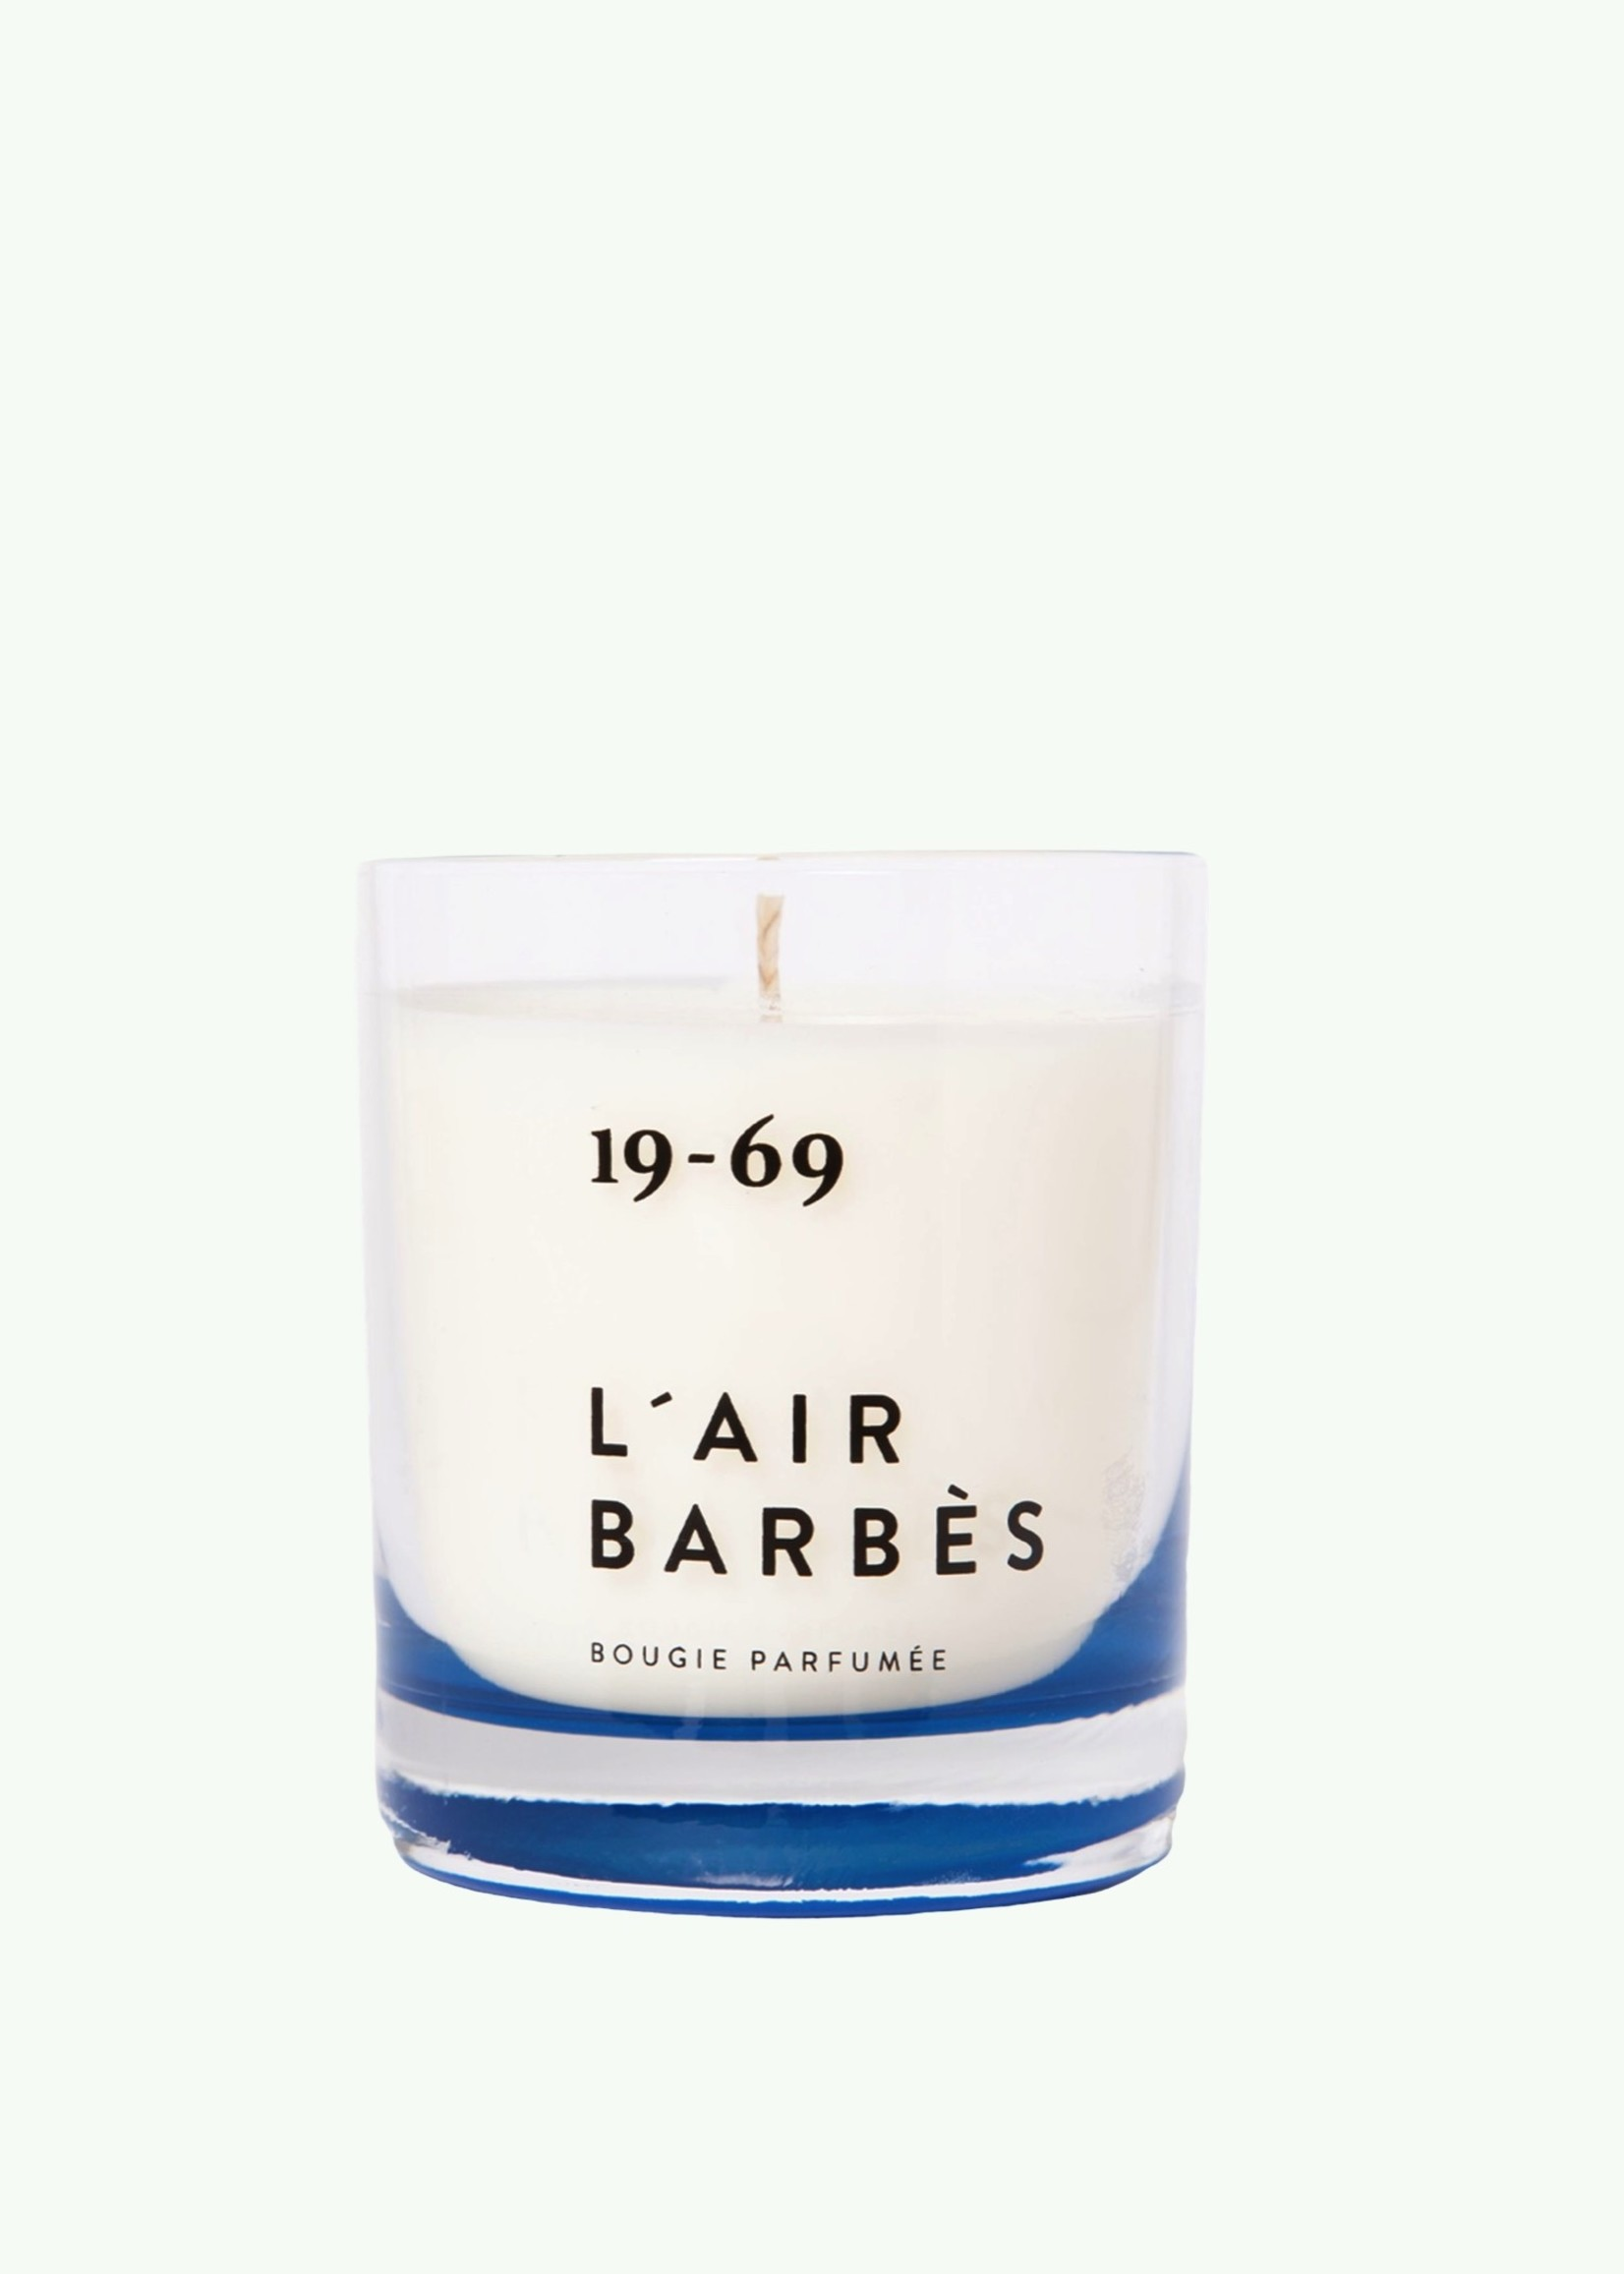 Nineteen Sixty Nine Nineteen sixty nine - L'air Barbès - Scented Candle 200 ml